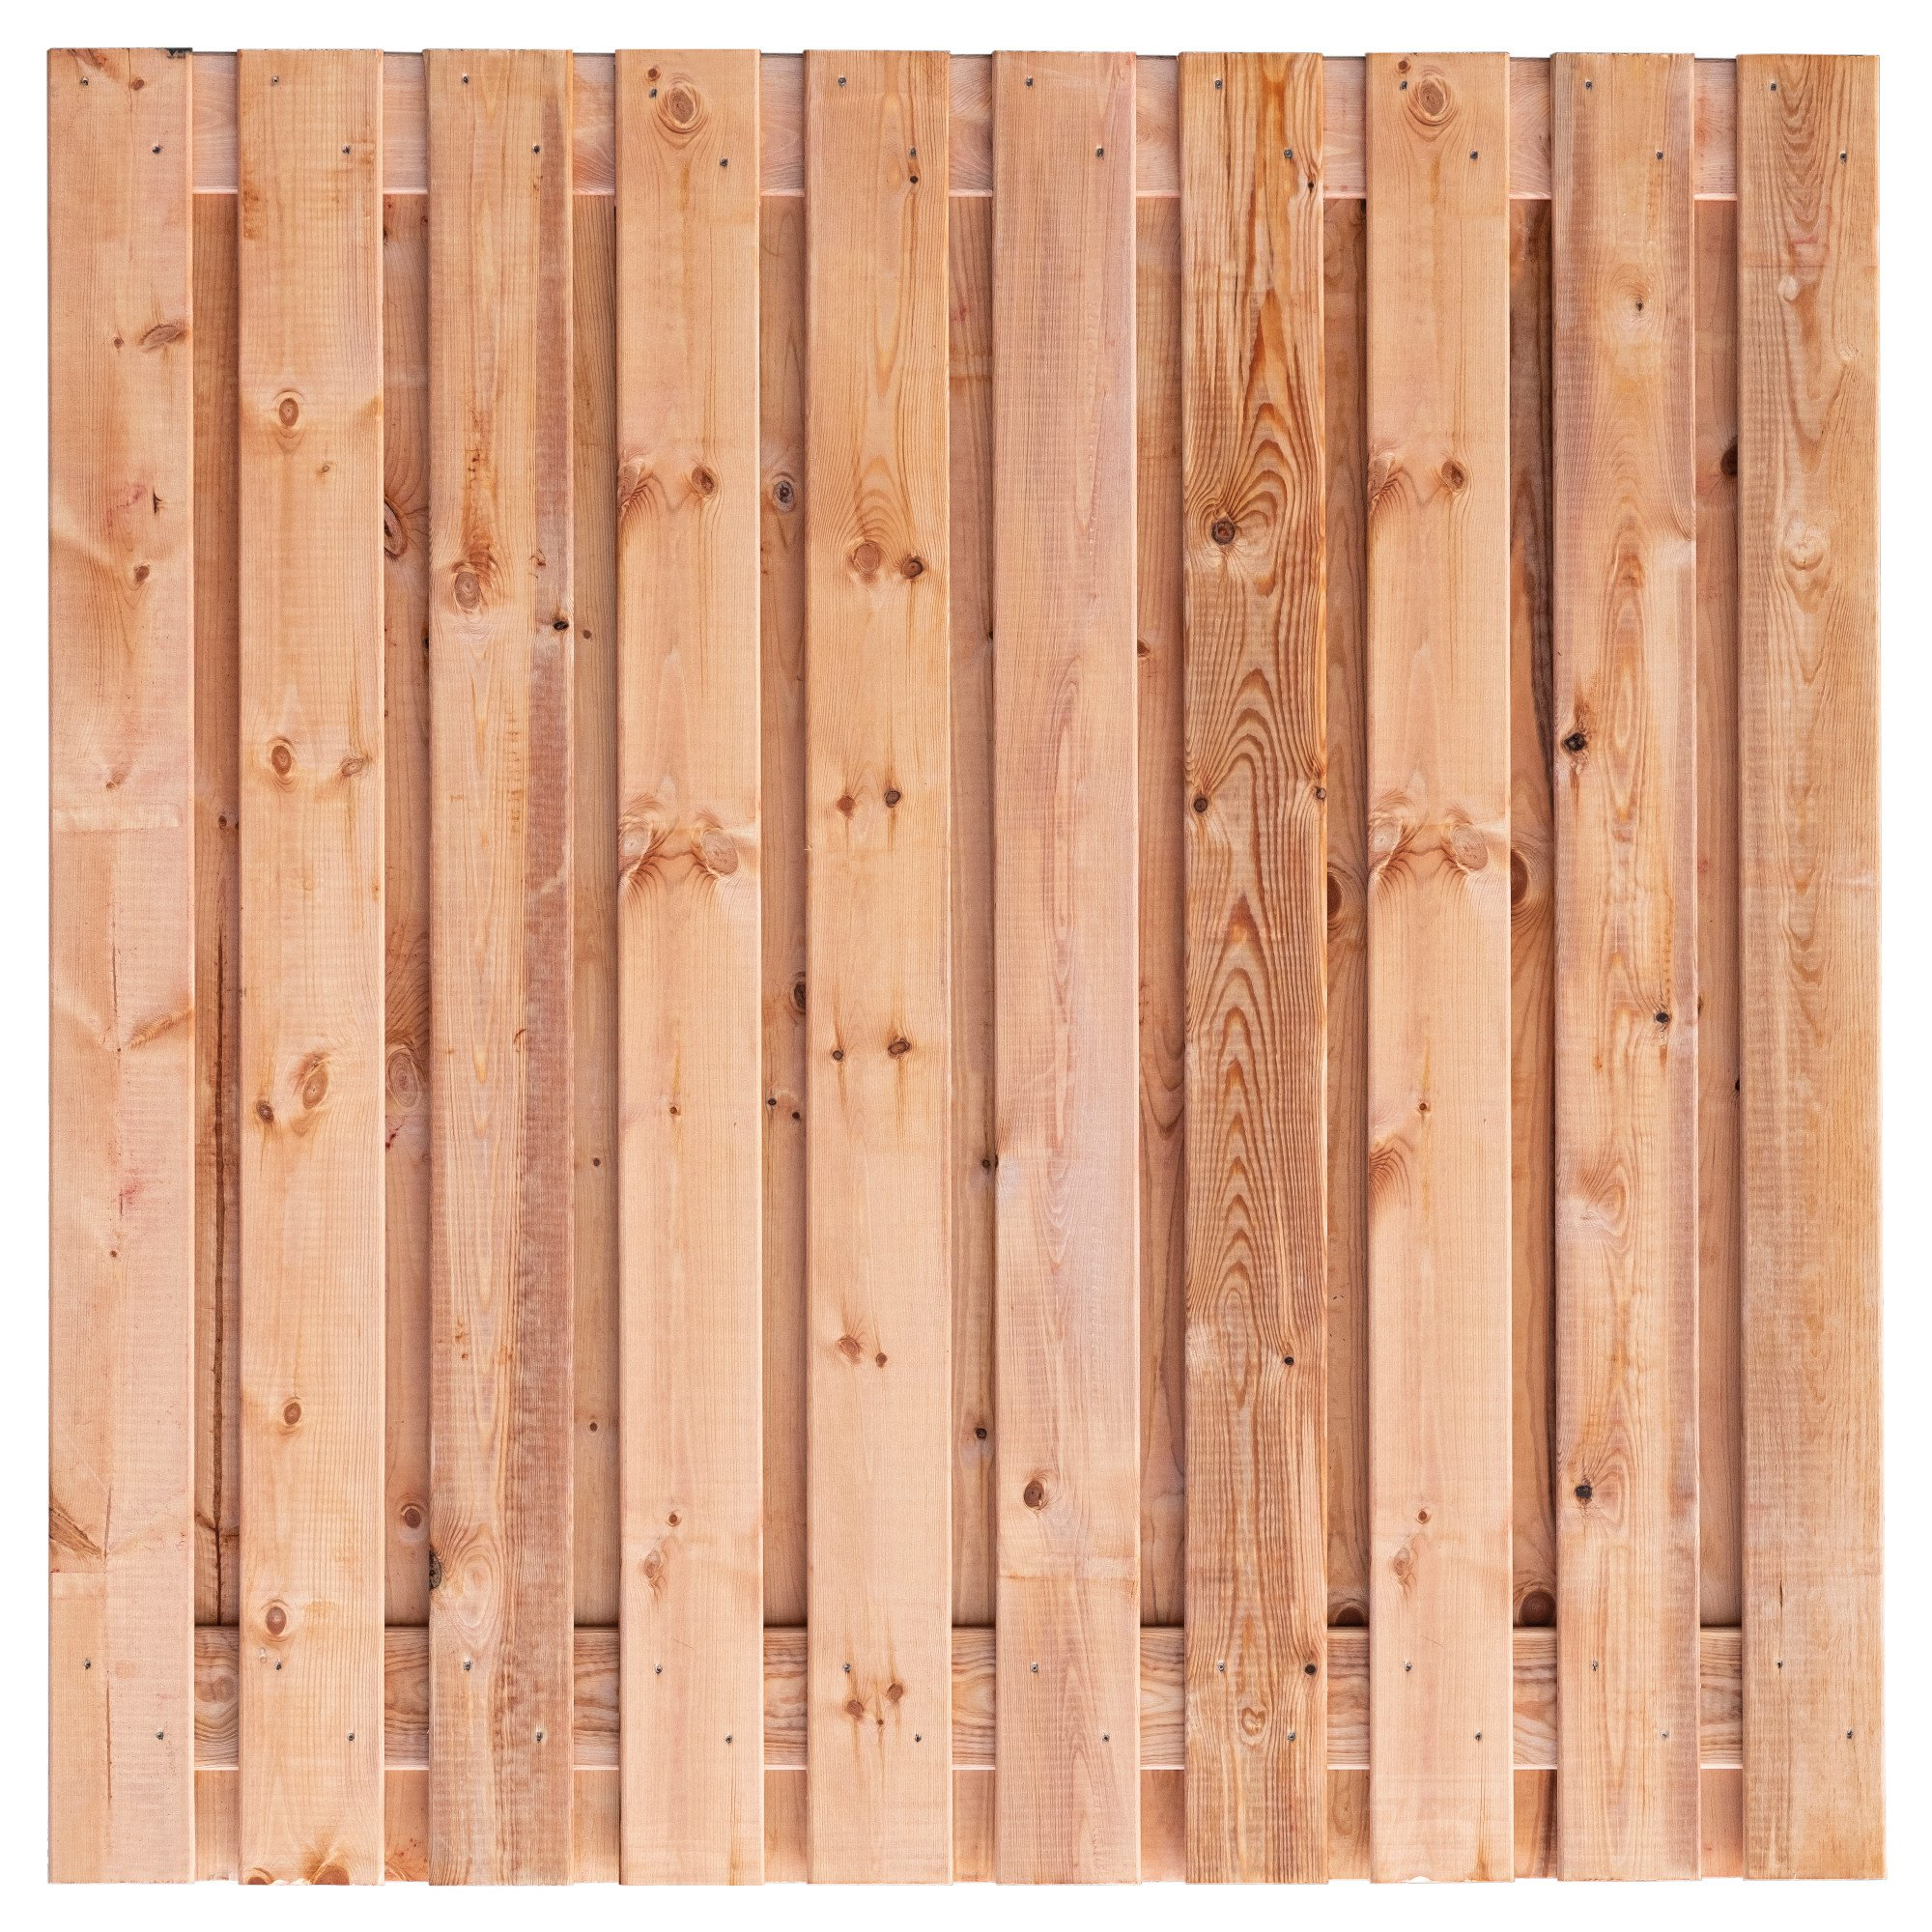 Red Class Wood schutting 180 x 180 cm. Type: Casablanca 180